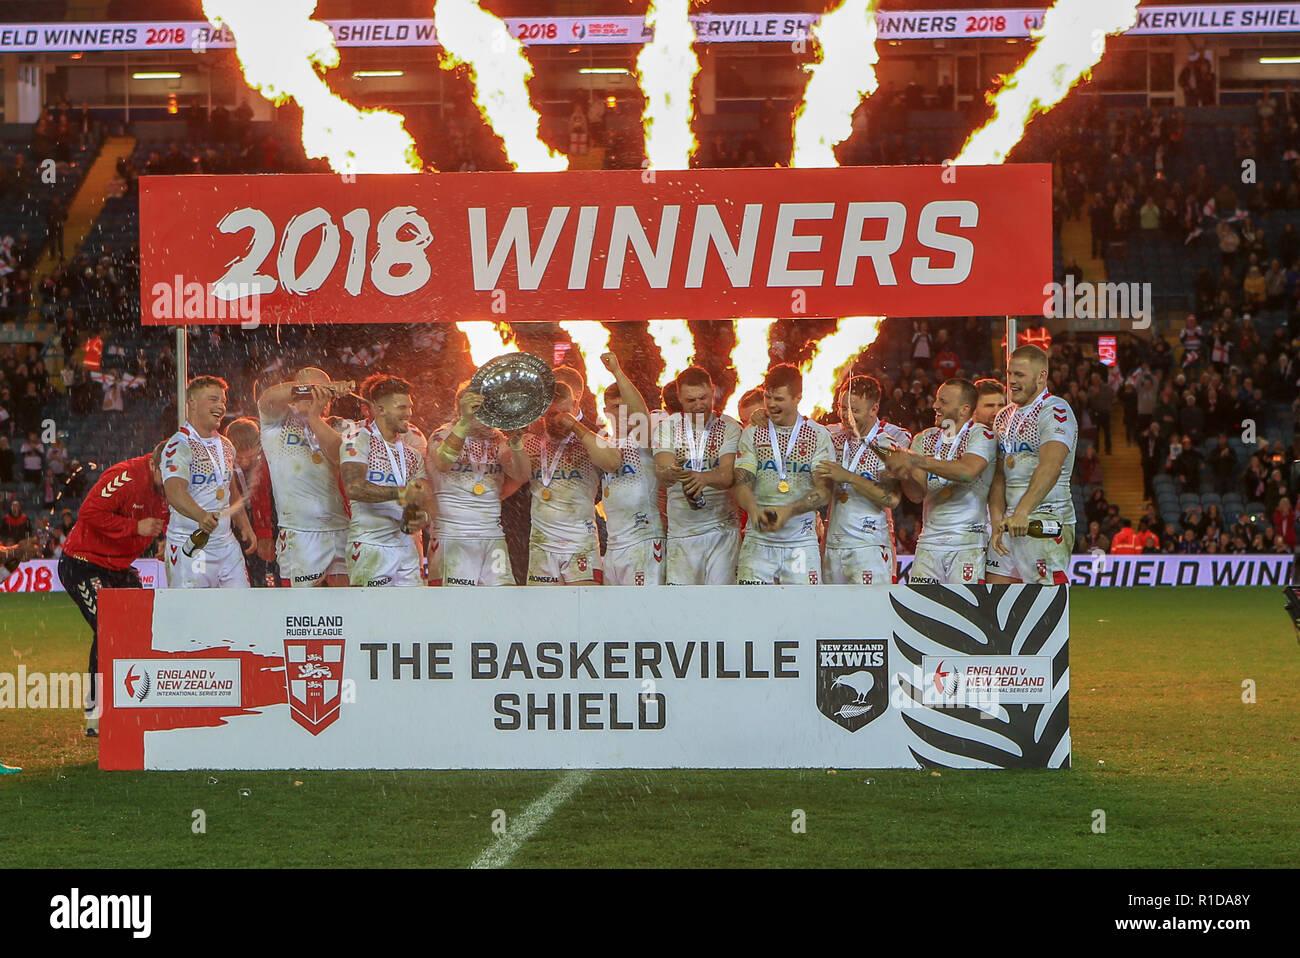 Leeds, UK. 11th Nov 2018. 11th November, Elland Road, Leeds, England ; Rugby League International  3rd Test Match , England v New Zealand ;  England lifting the Baskerville Shield Credit:  Craig Milner/News Images Credit: News Images /Alamy Live News Stock Photo